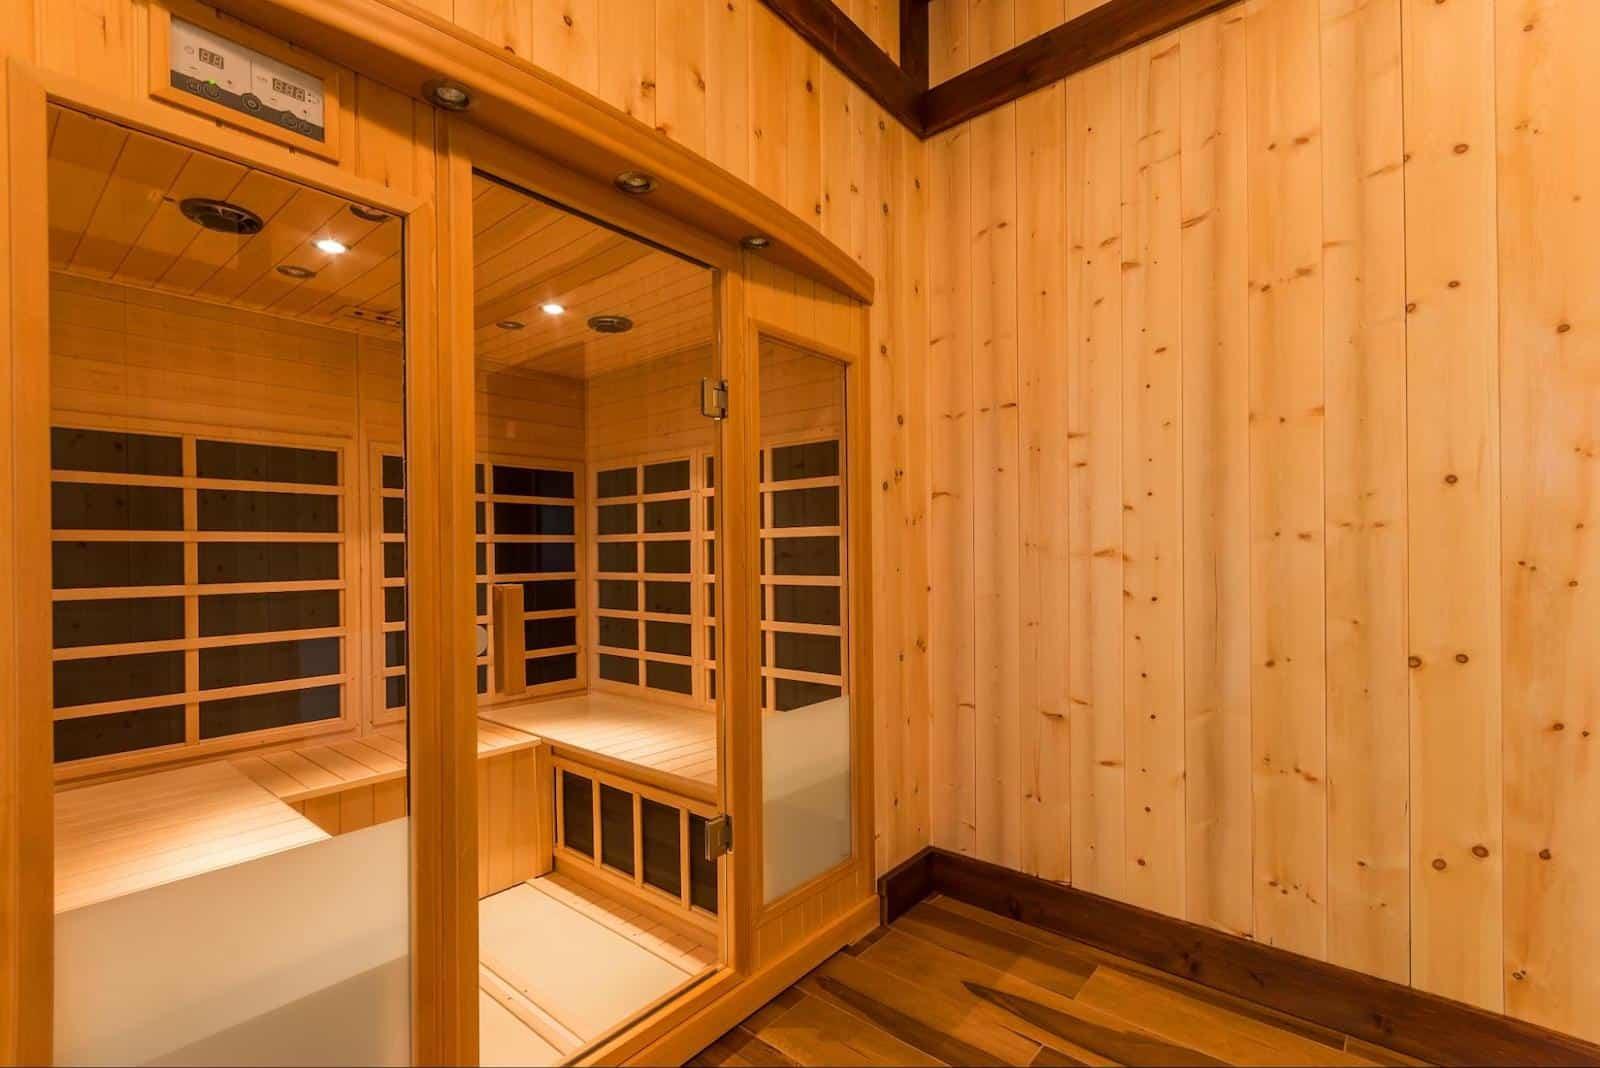 infrared sauna benefits and disadvantages: empty sauna